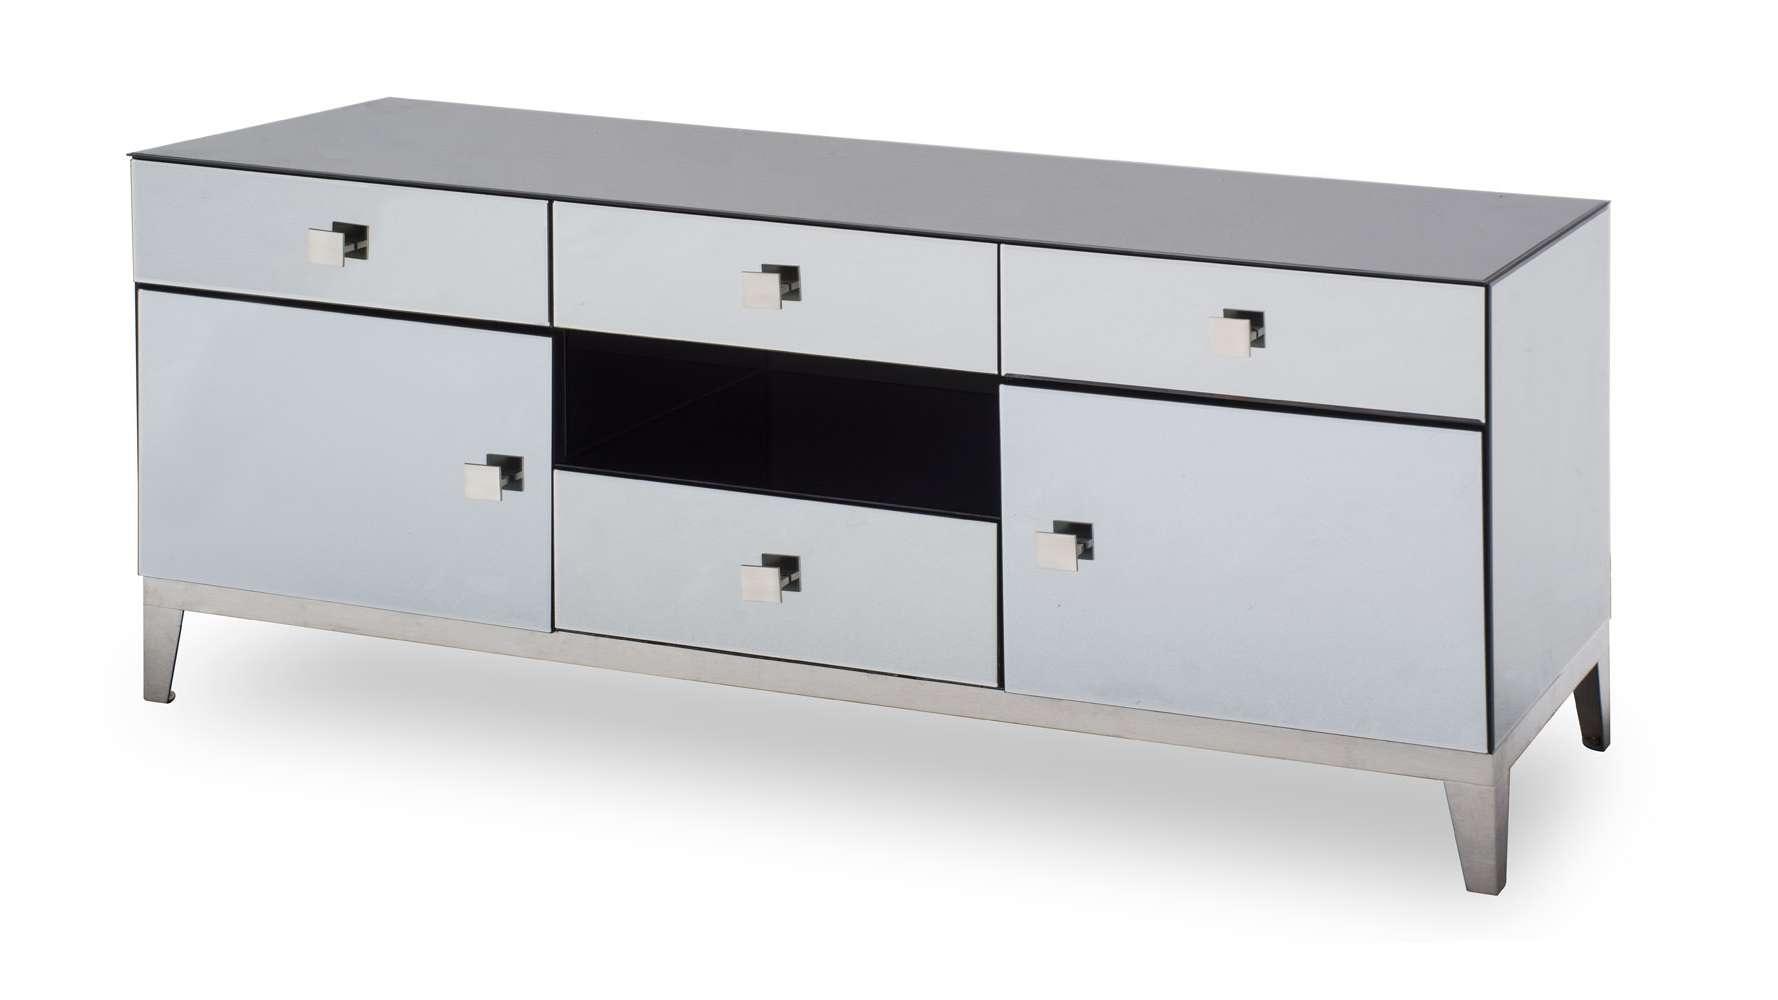 Modern Grey Mirrored Glass Berlin Tv Stand | Zuri Furniture Within Mirror Tv Cabinets (View 13 of 20)